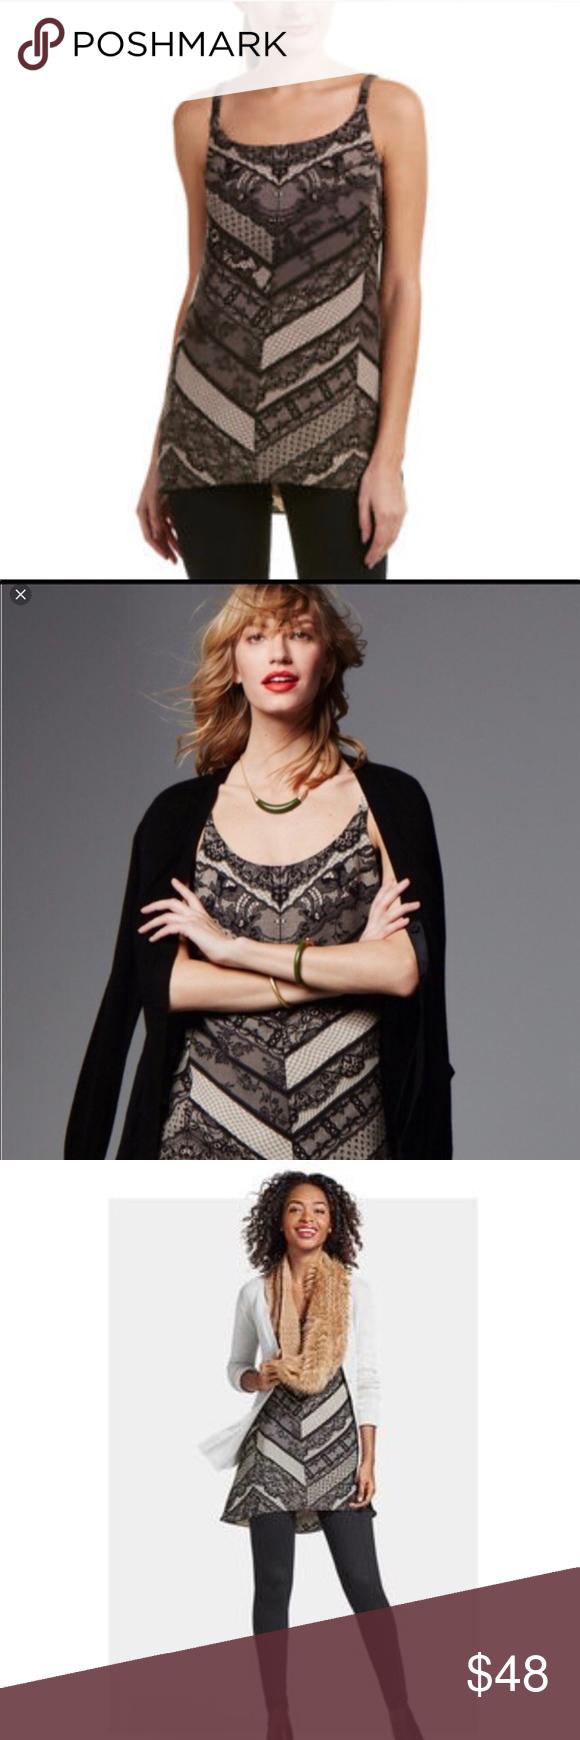 Black Lace Print Monaco Cami Top 3278 Nwt Cabi A